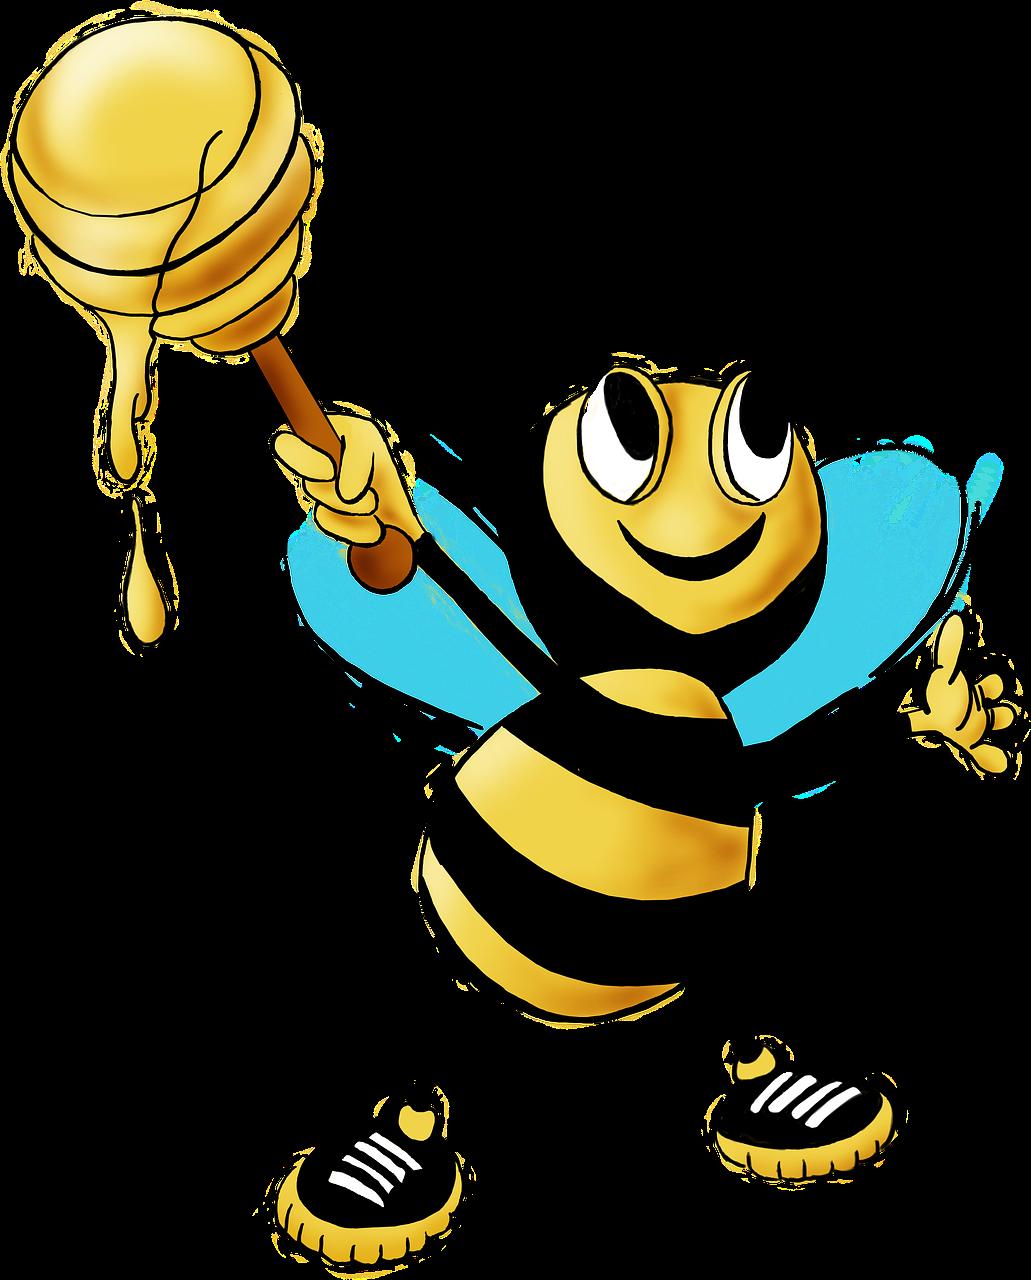 Honey clipart honey cake. Bee olio olive oil